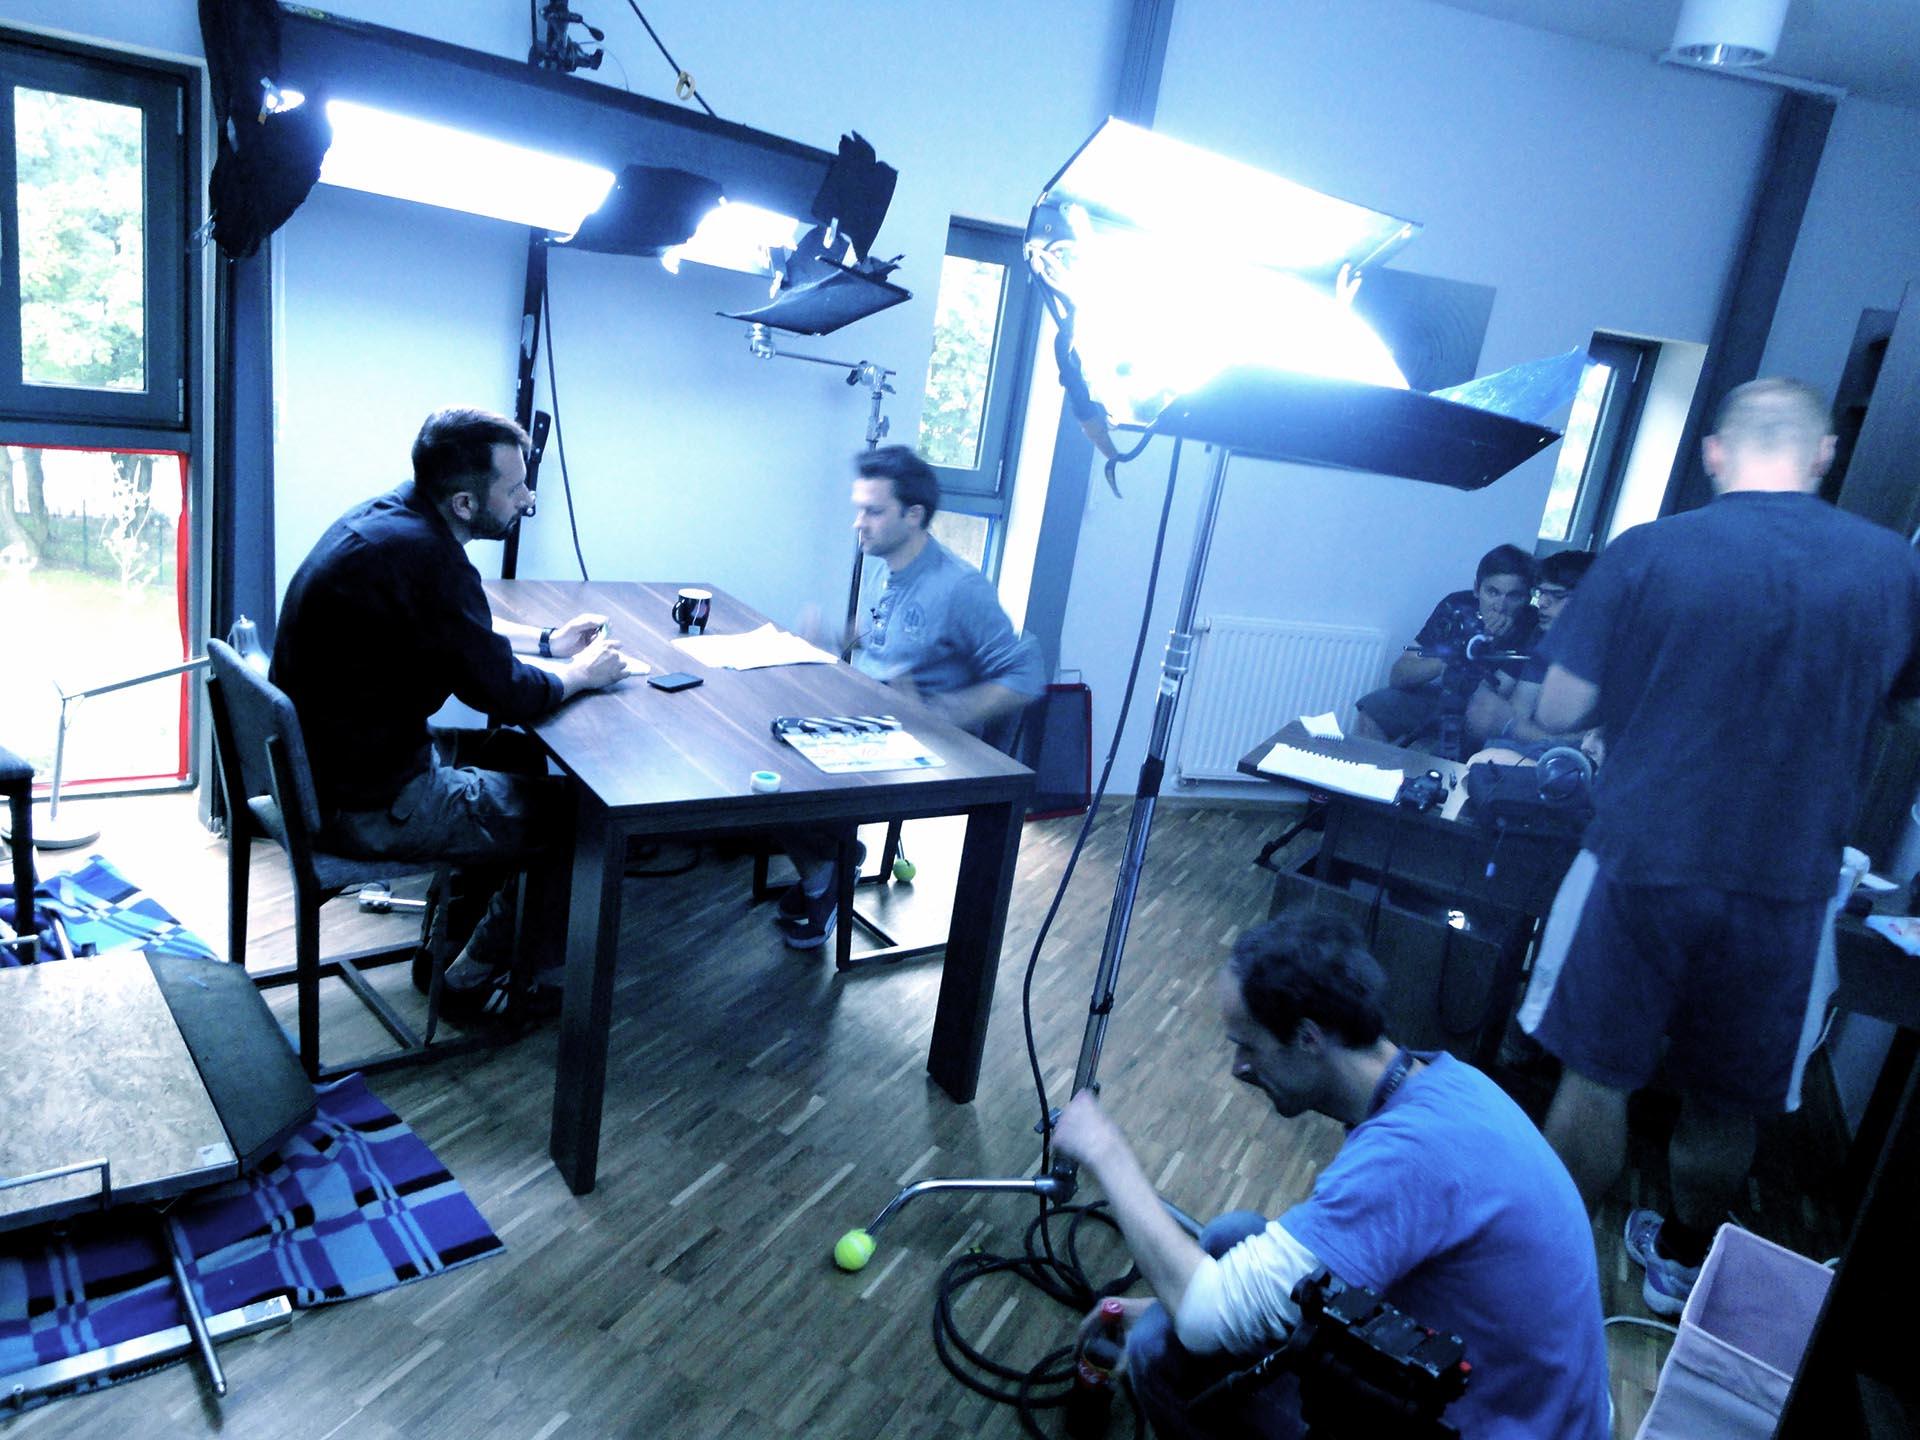 zdjęcia making of film De facto